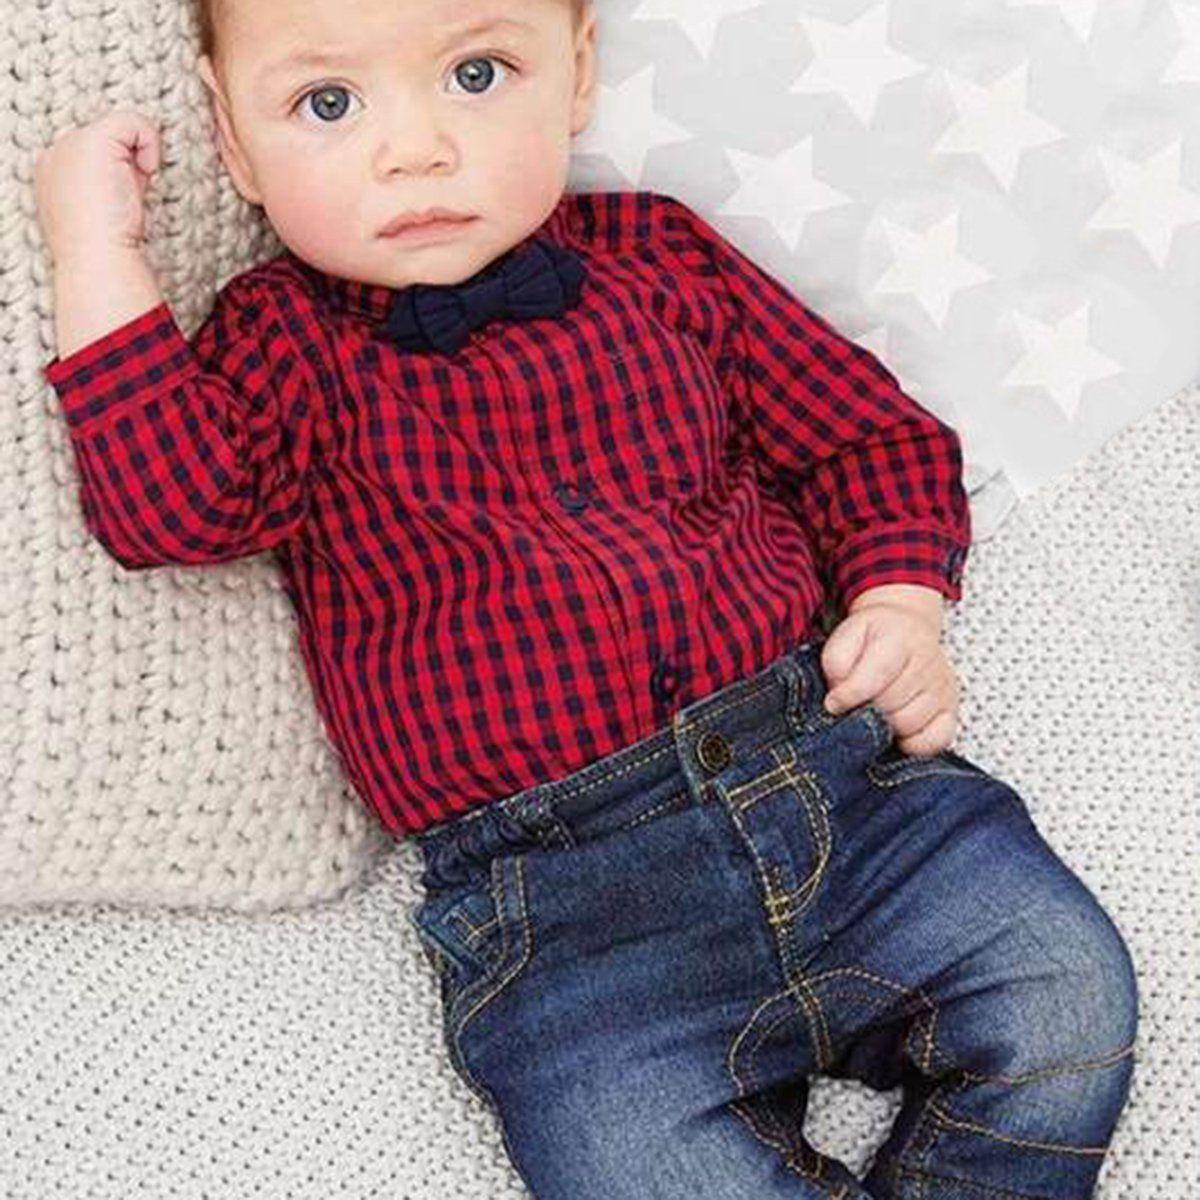 2pcs Bébé Garçon Enfants Shirt Hauts Pantalons longs vêtements tenues Gentleman Set